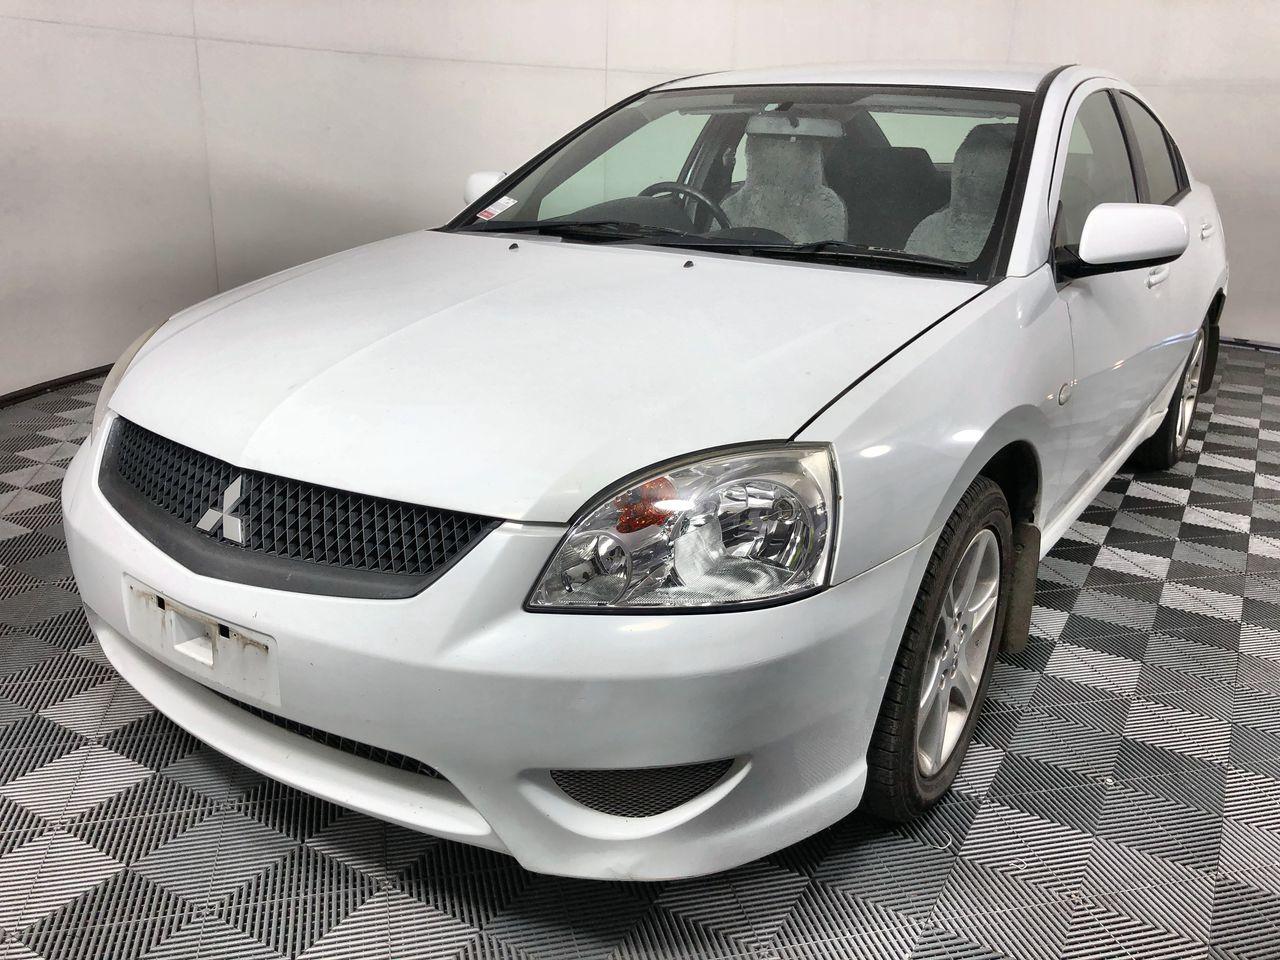 2007 Mitsubishi 380 VRX Automatic Sedan (WOVR)